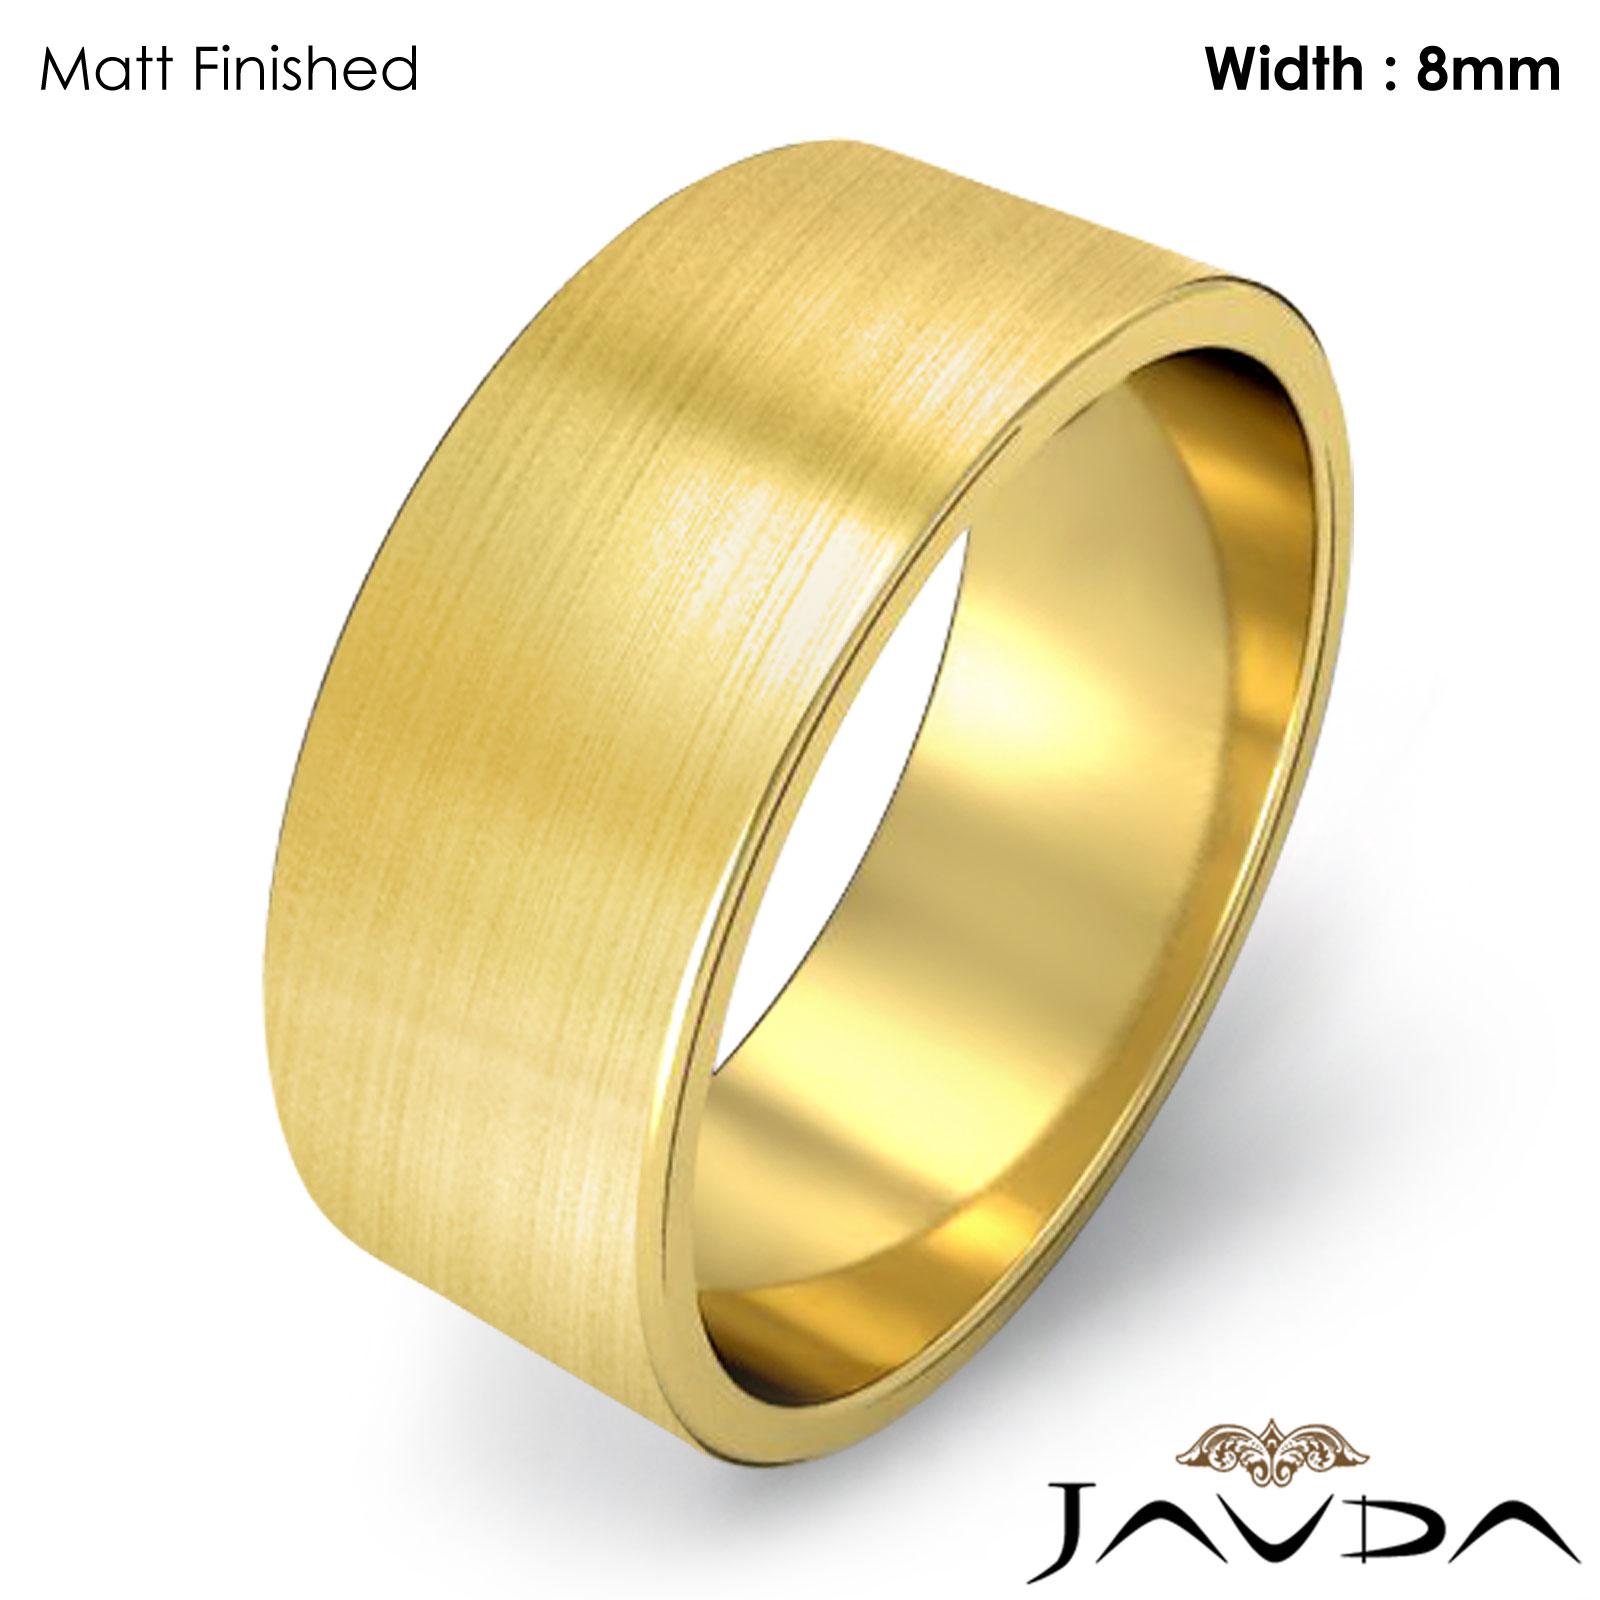 Men Wedding Band Flat Pipe Cut Plain Matte Ring 8mm 14k Yellow Gold 82gm 9 975